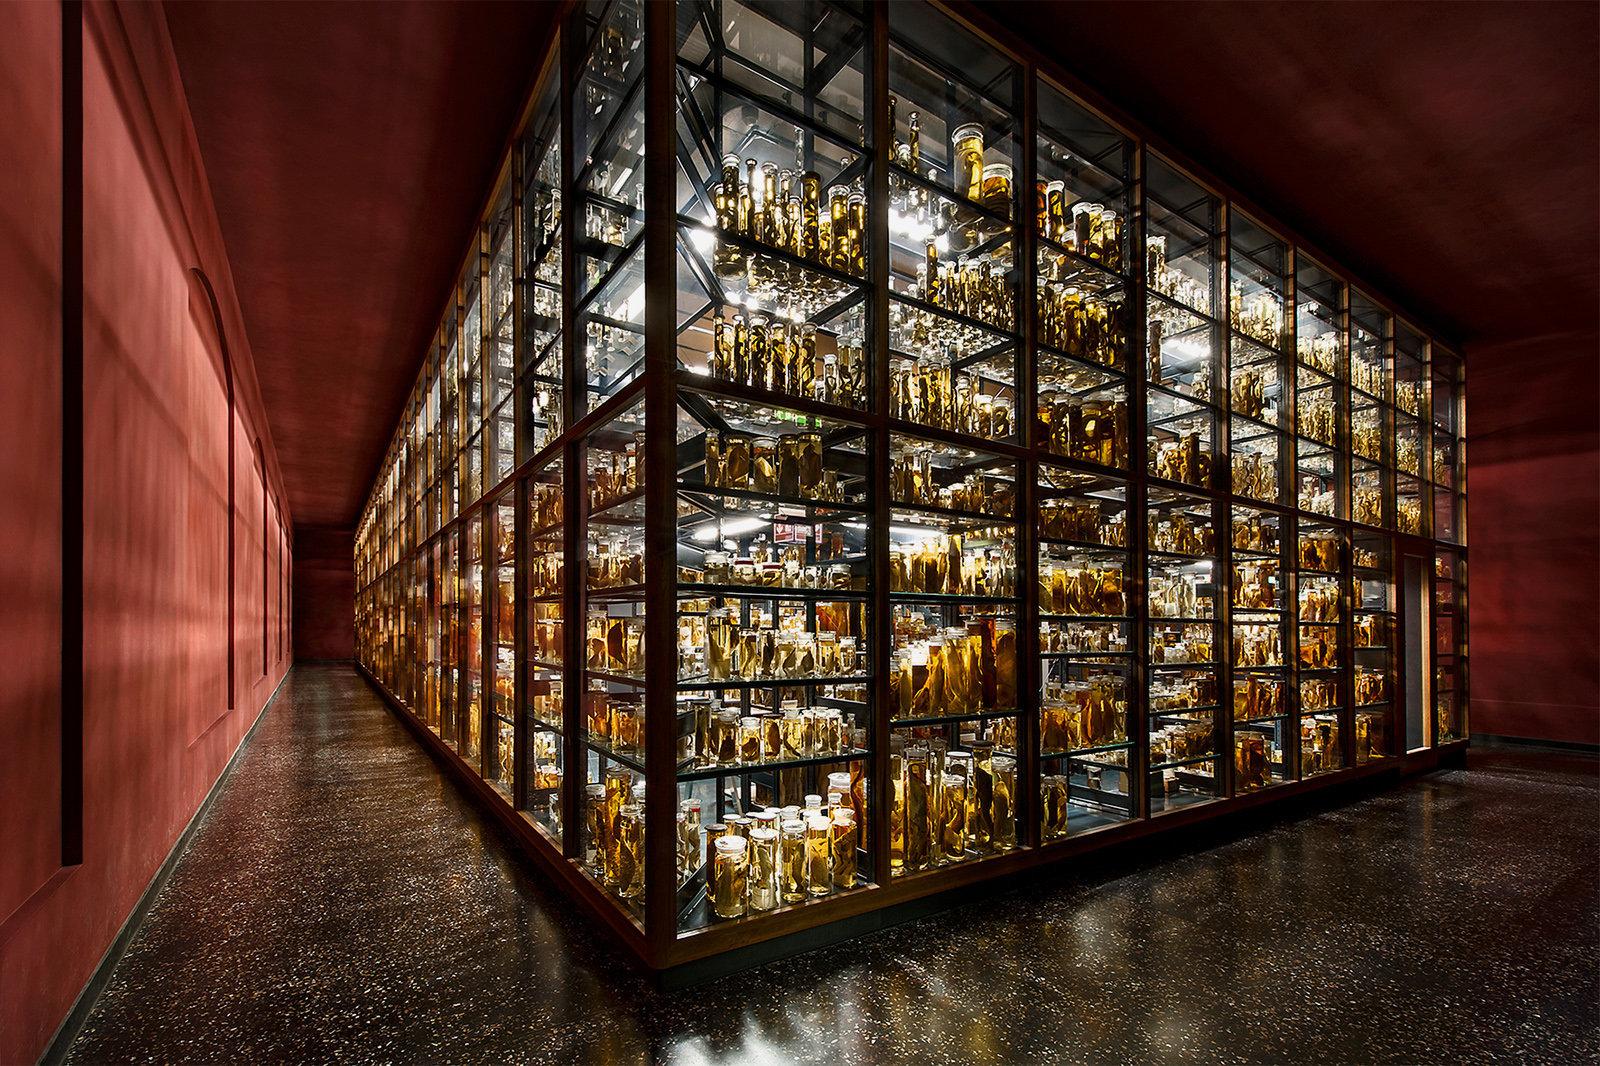 Museumsfotografie-Naturkundemuseum-Berlin-1.jpg